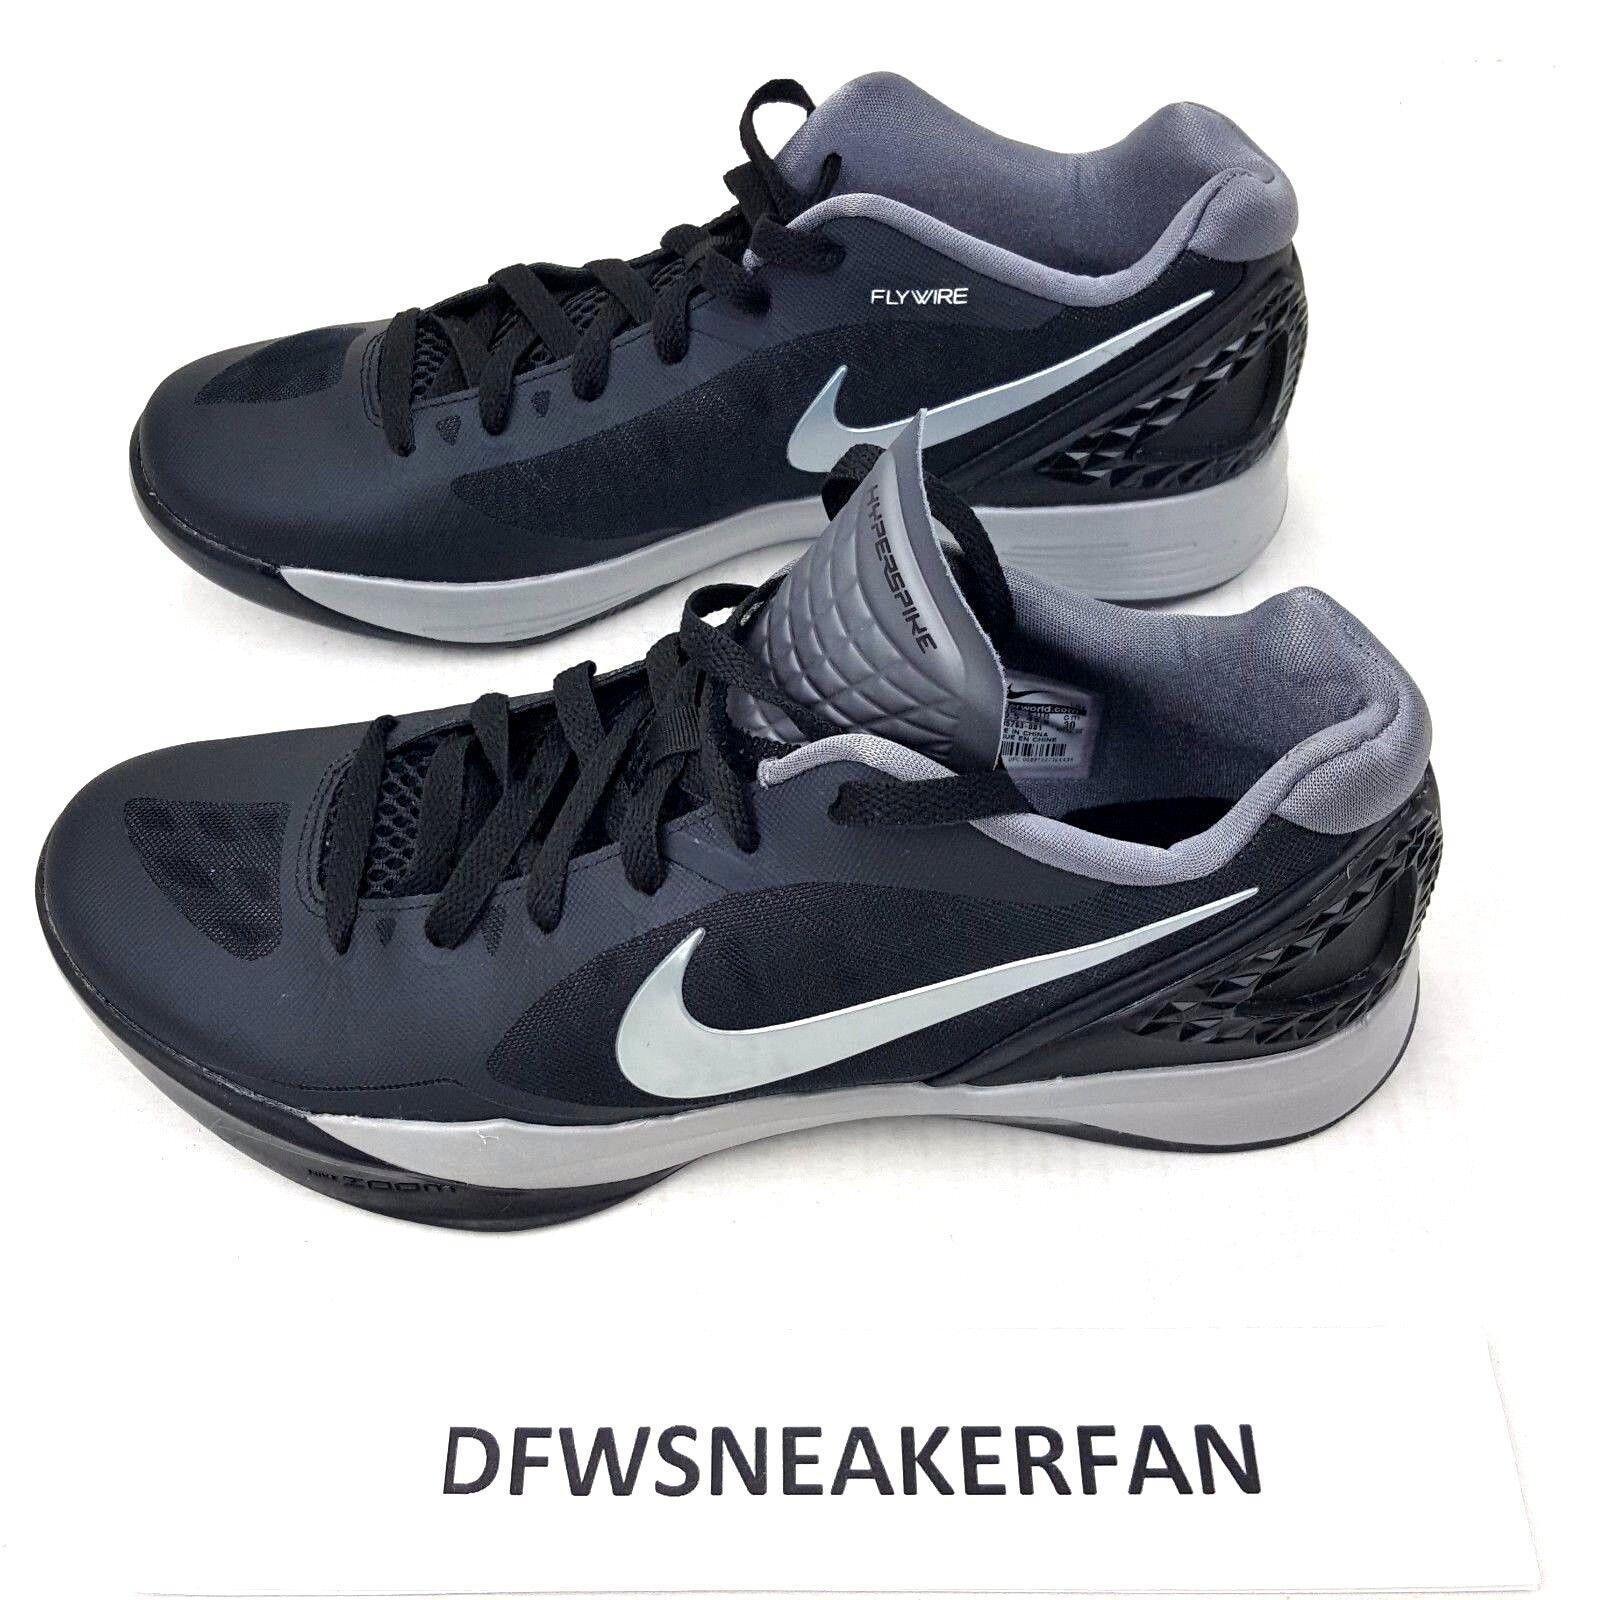 Nike Volley Zoom Hyperspike Volleyball Shoe Women SZ 10.5 Black Gray 585763-001